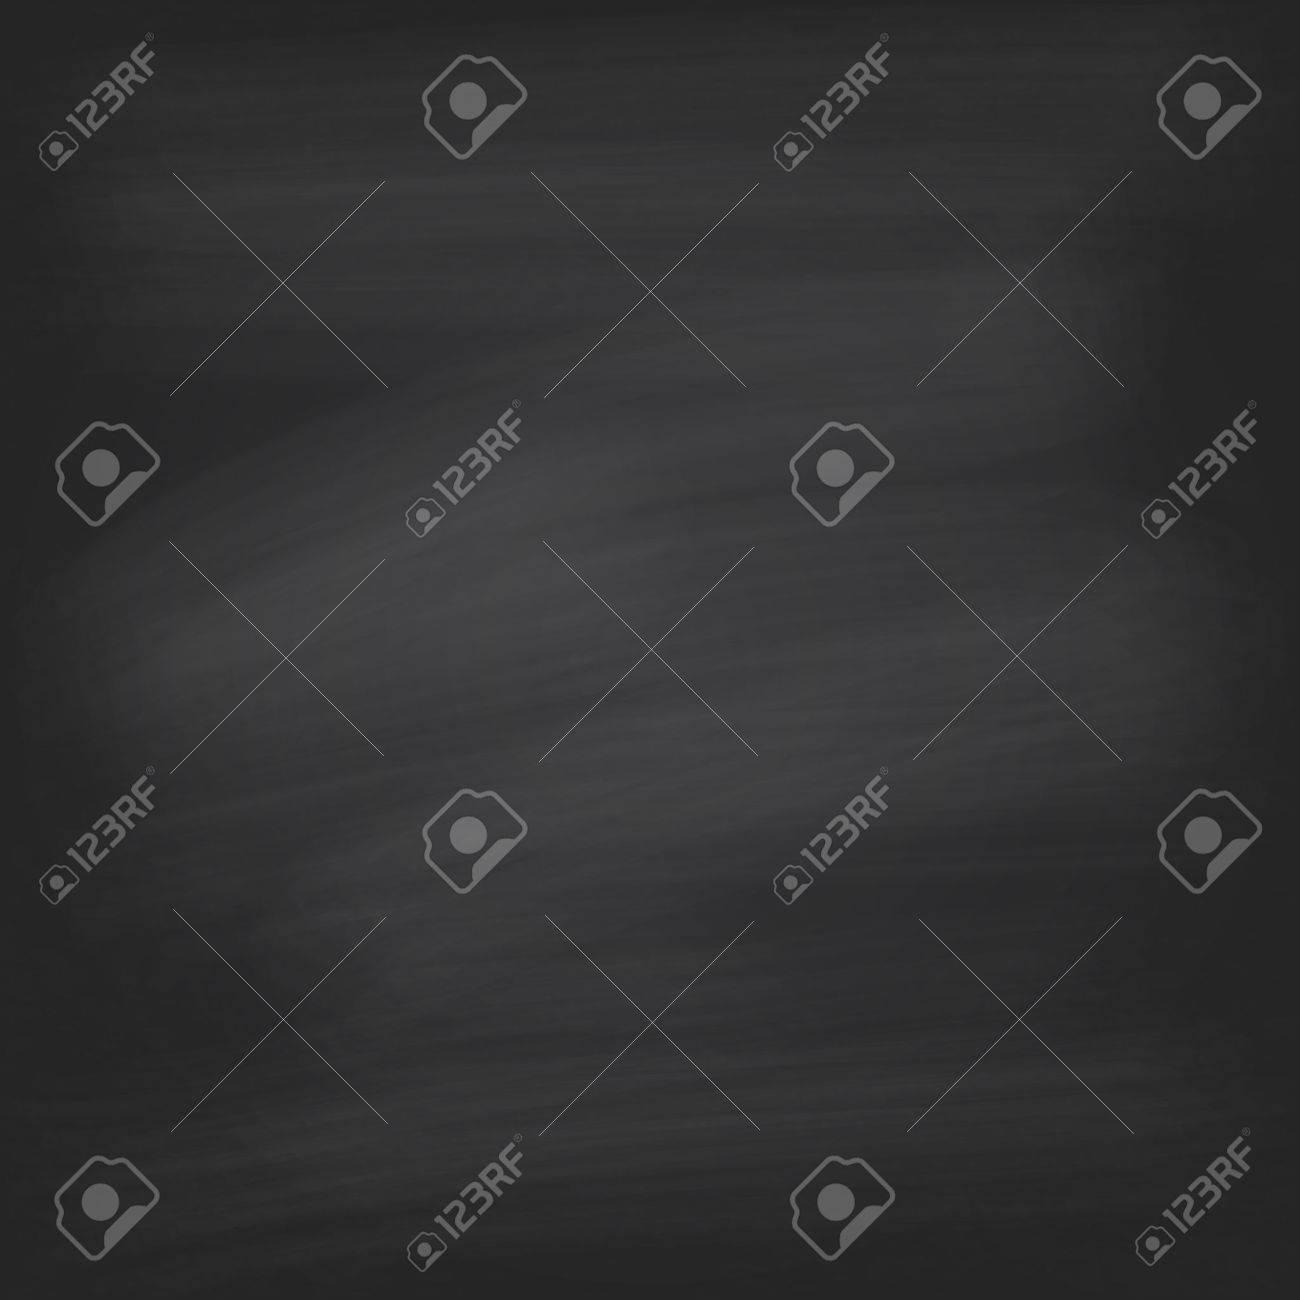 Black chalkboard background. Vector illustration. School board background - 29382173